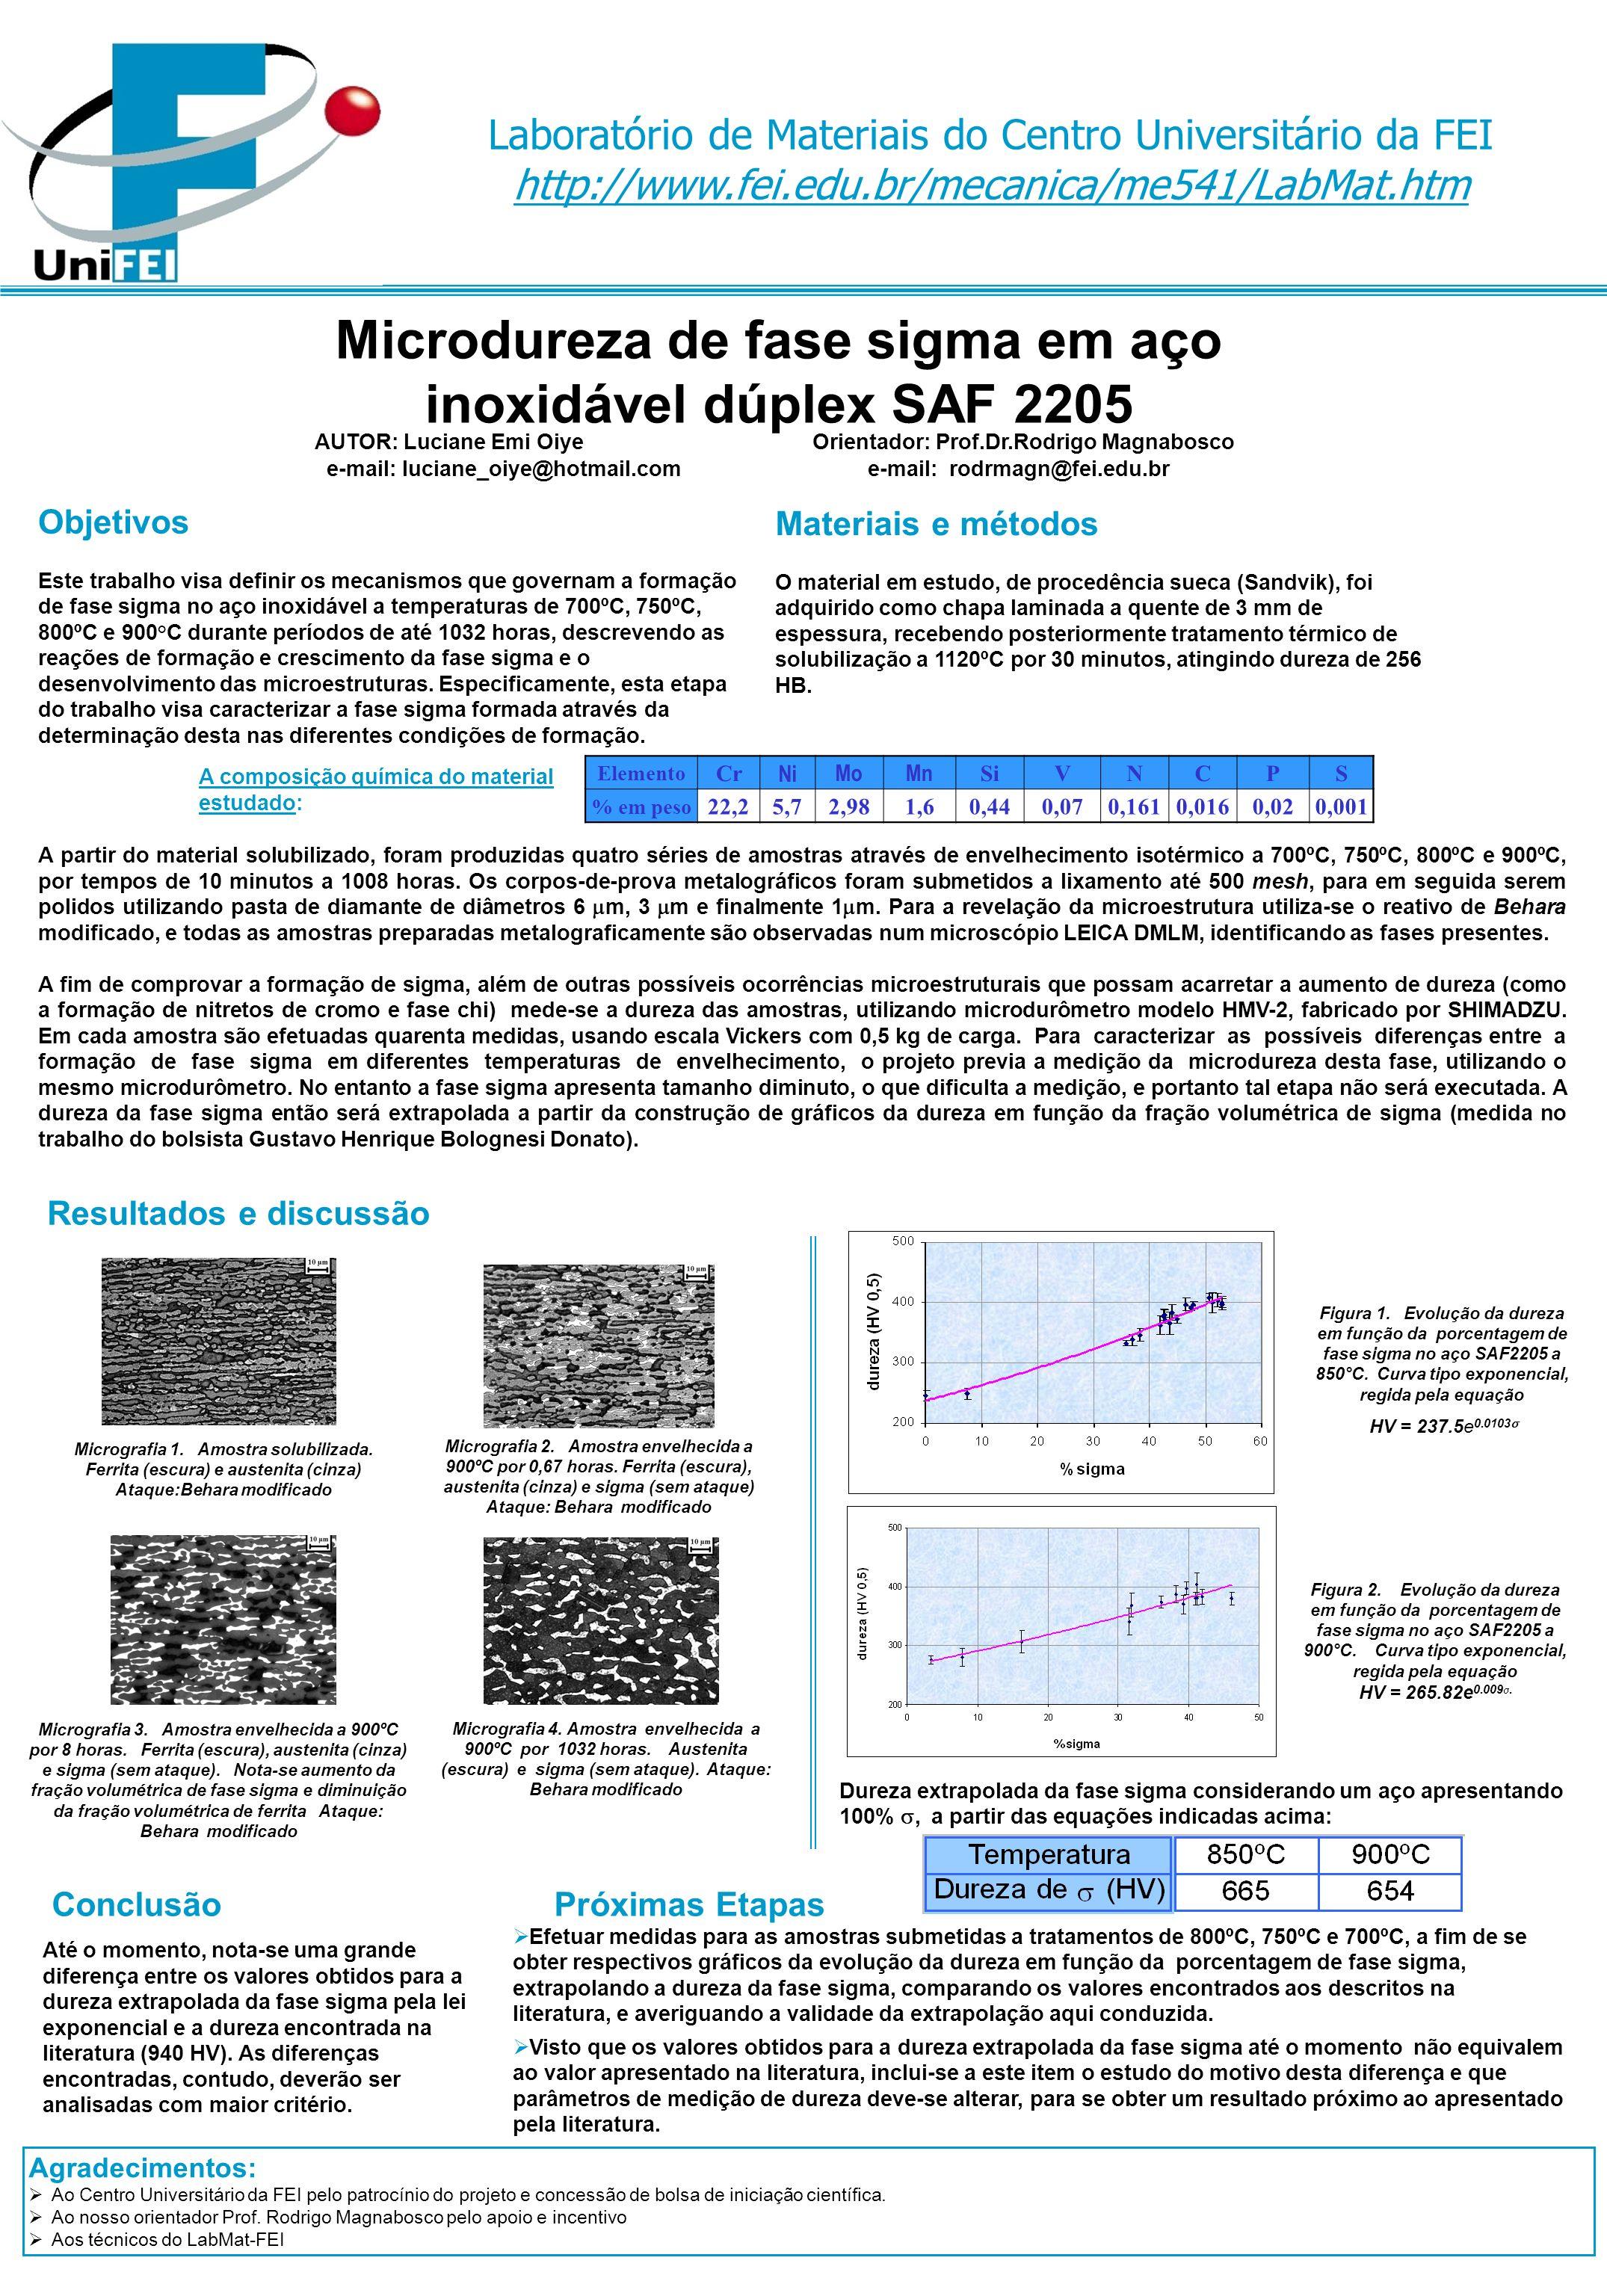 Microdureza de fase sigma em aço inoxidável dúplex SAF 2205